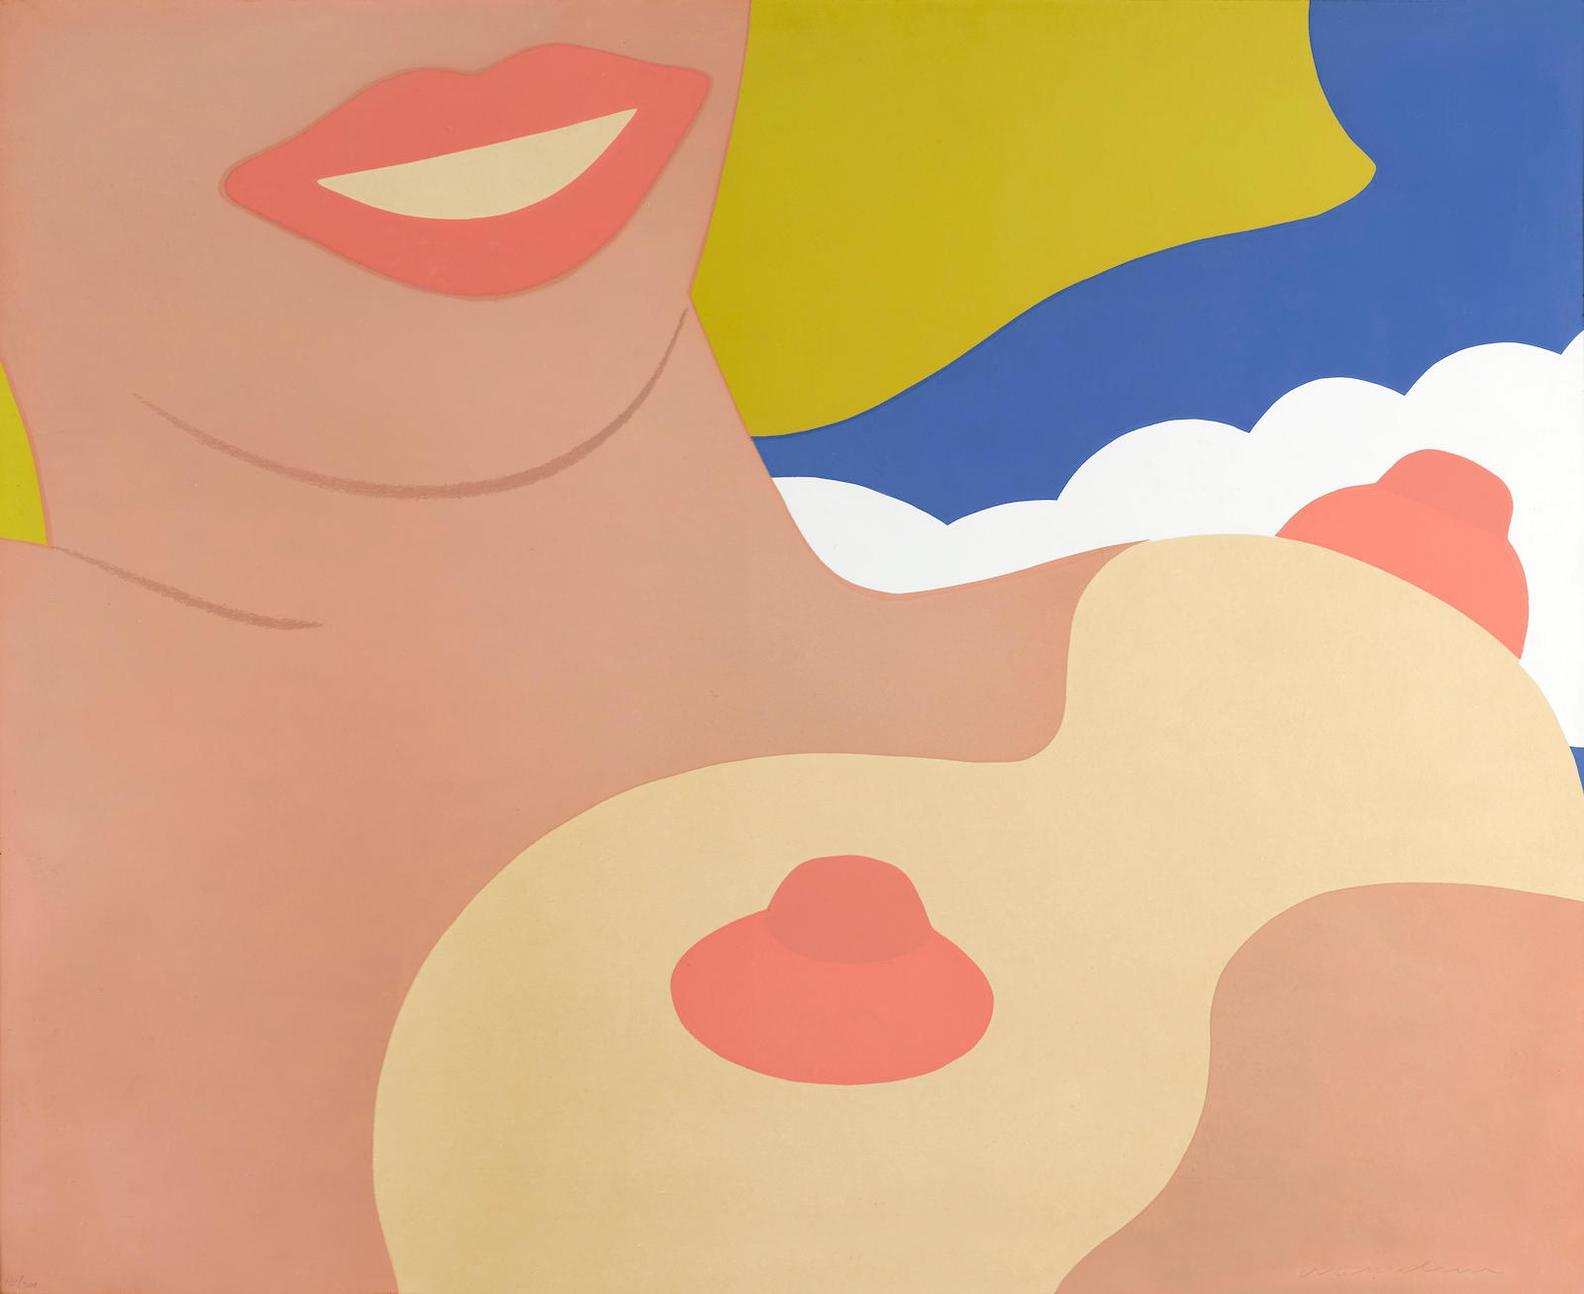 Tom Wesselmann-Nude, From 11 Pop Artists, Volume II-1965